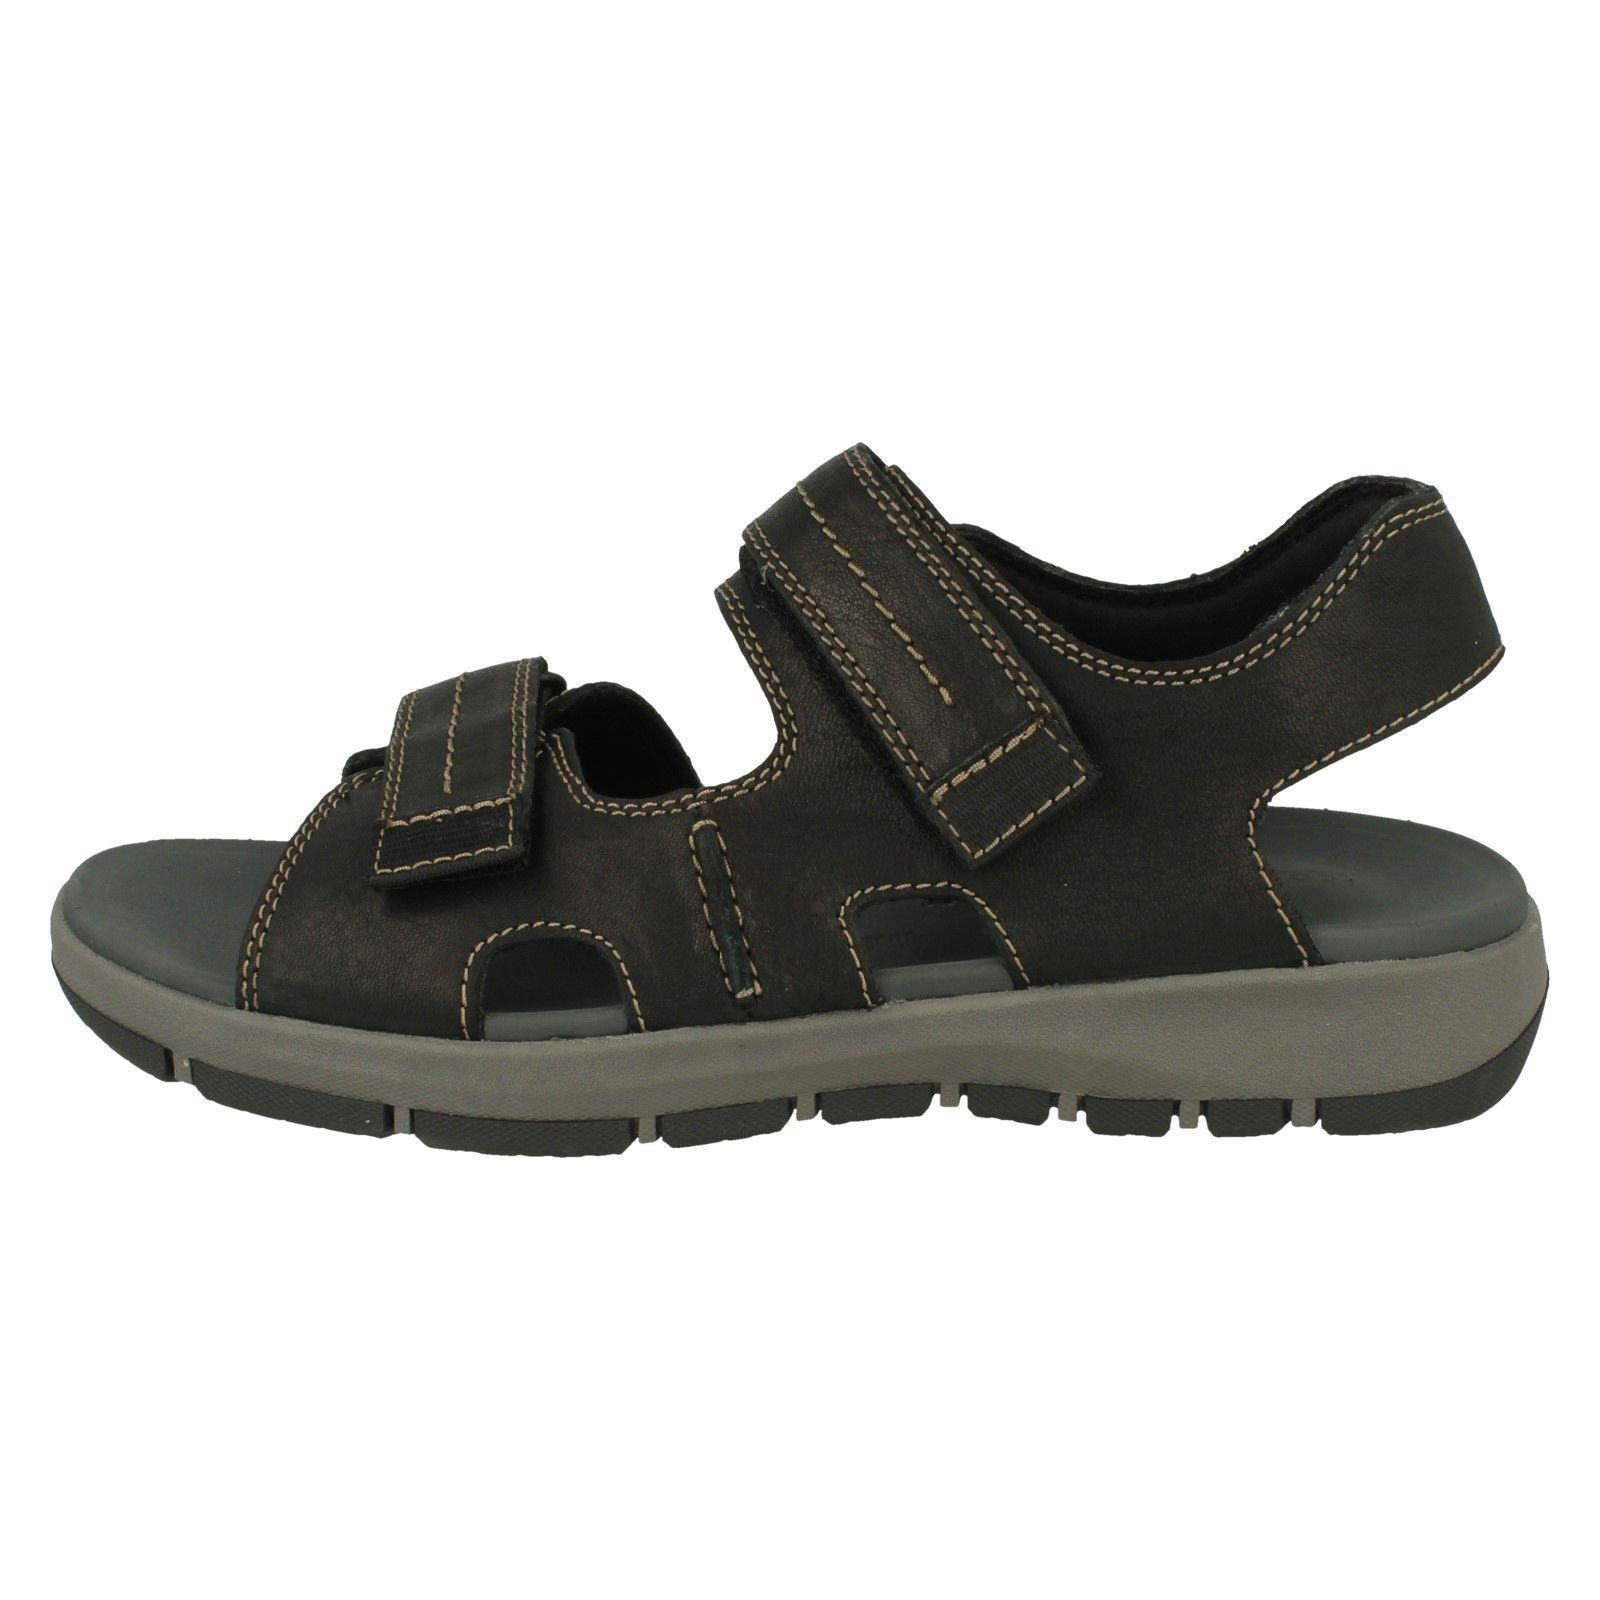 Mens Clarks Hook /& Loop Fastening Sandals /'Brixby Shore/'